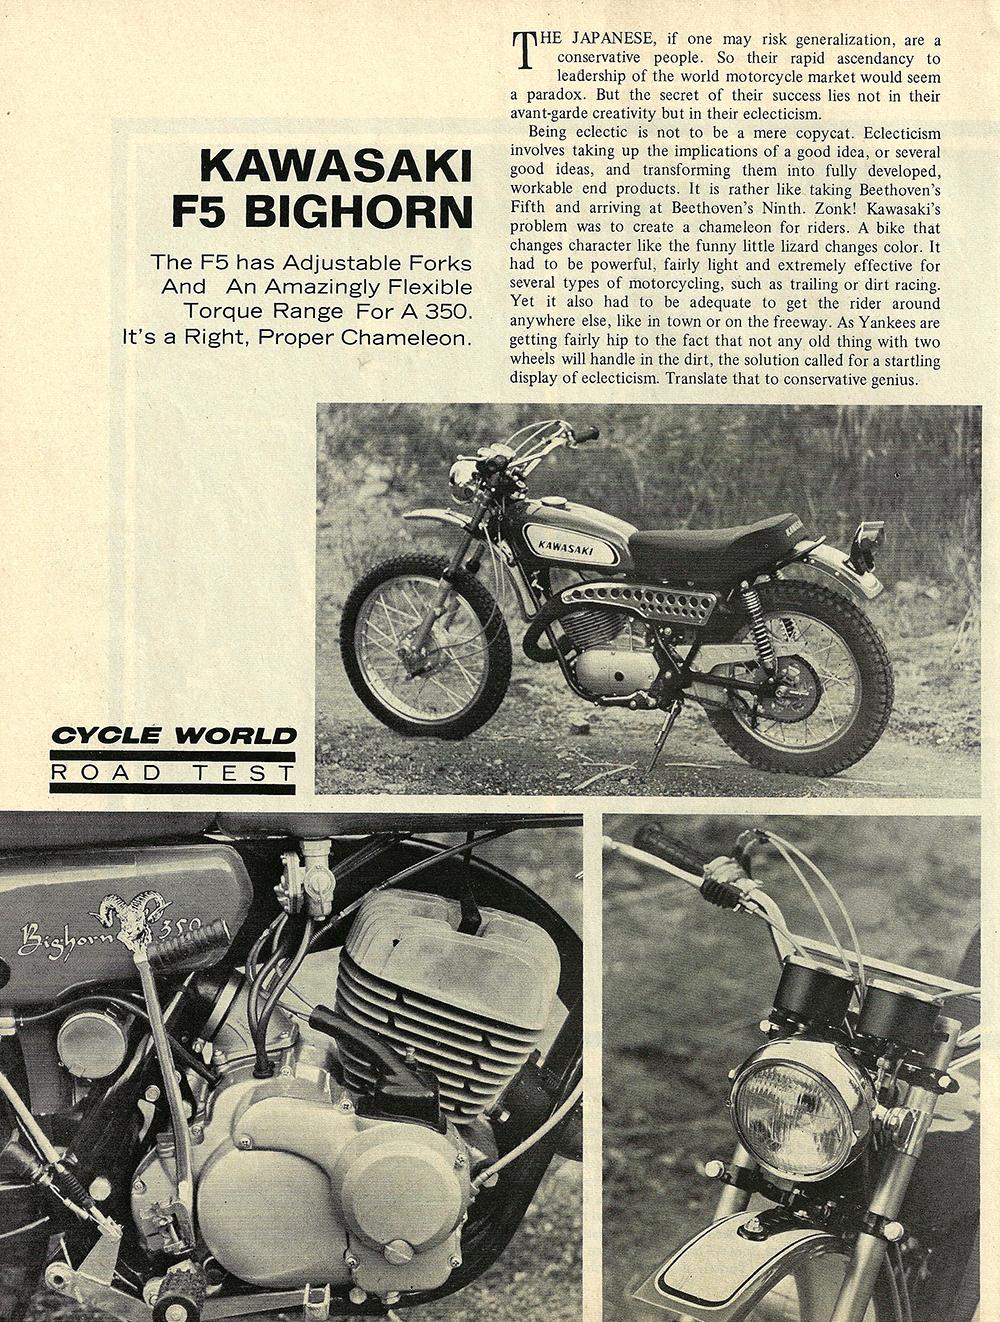 1970 Kawasaki F5 Bighorn road test 01.jpg